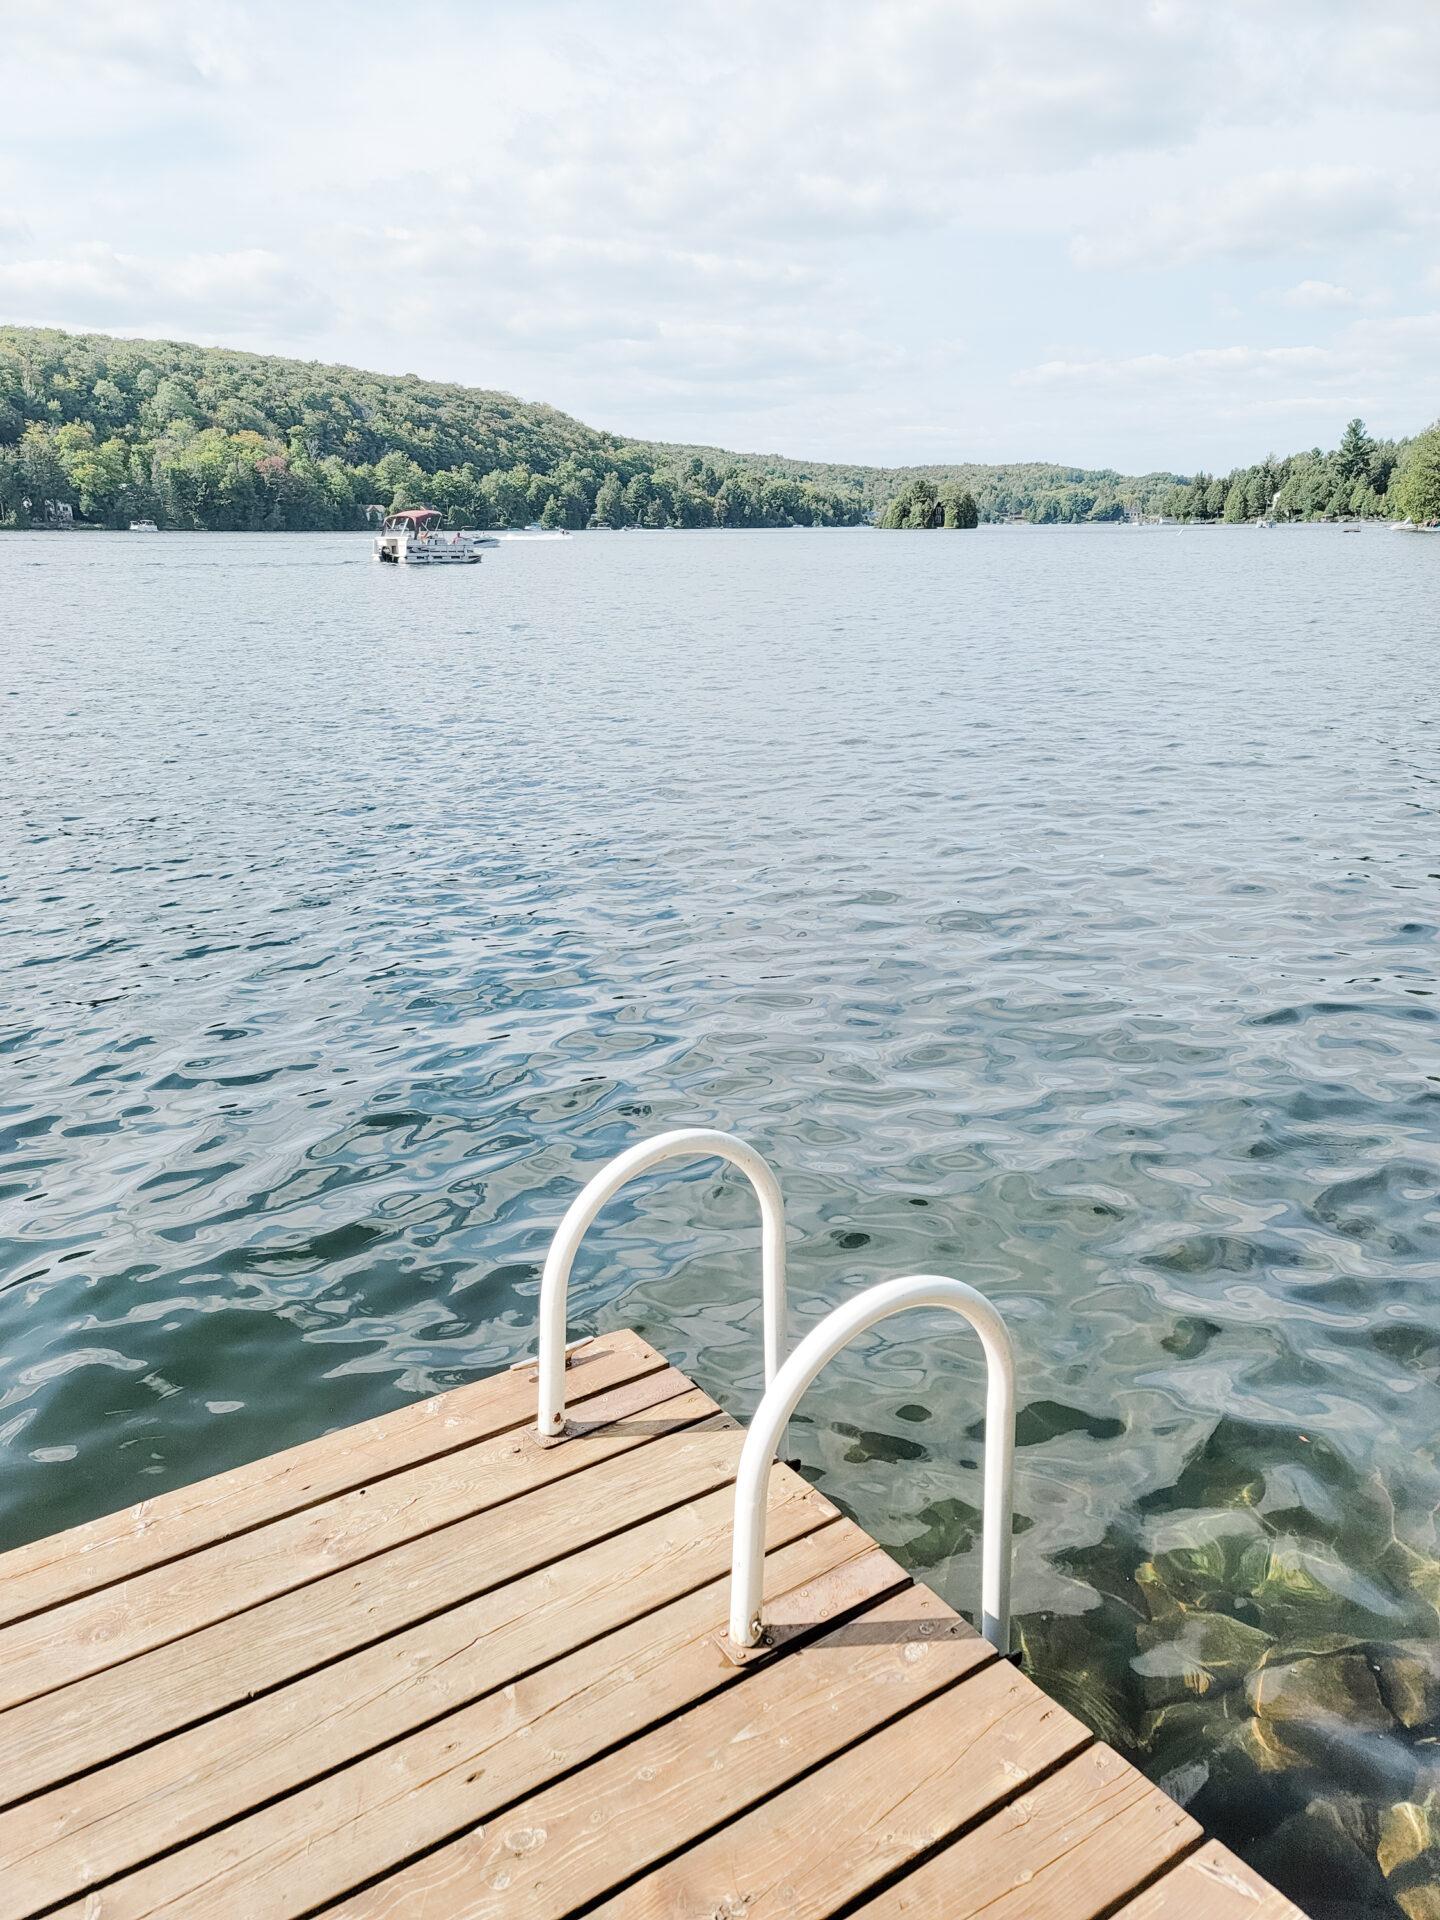 Lake views during summer in quebec